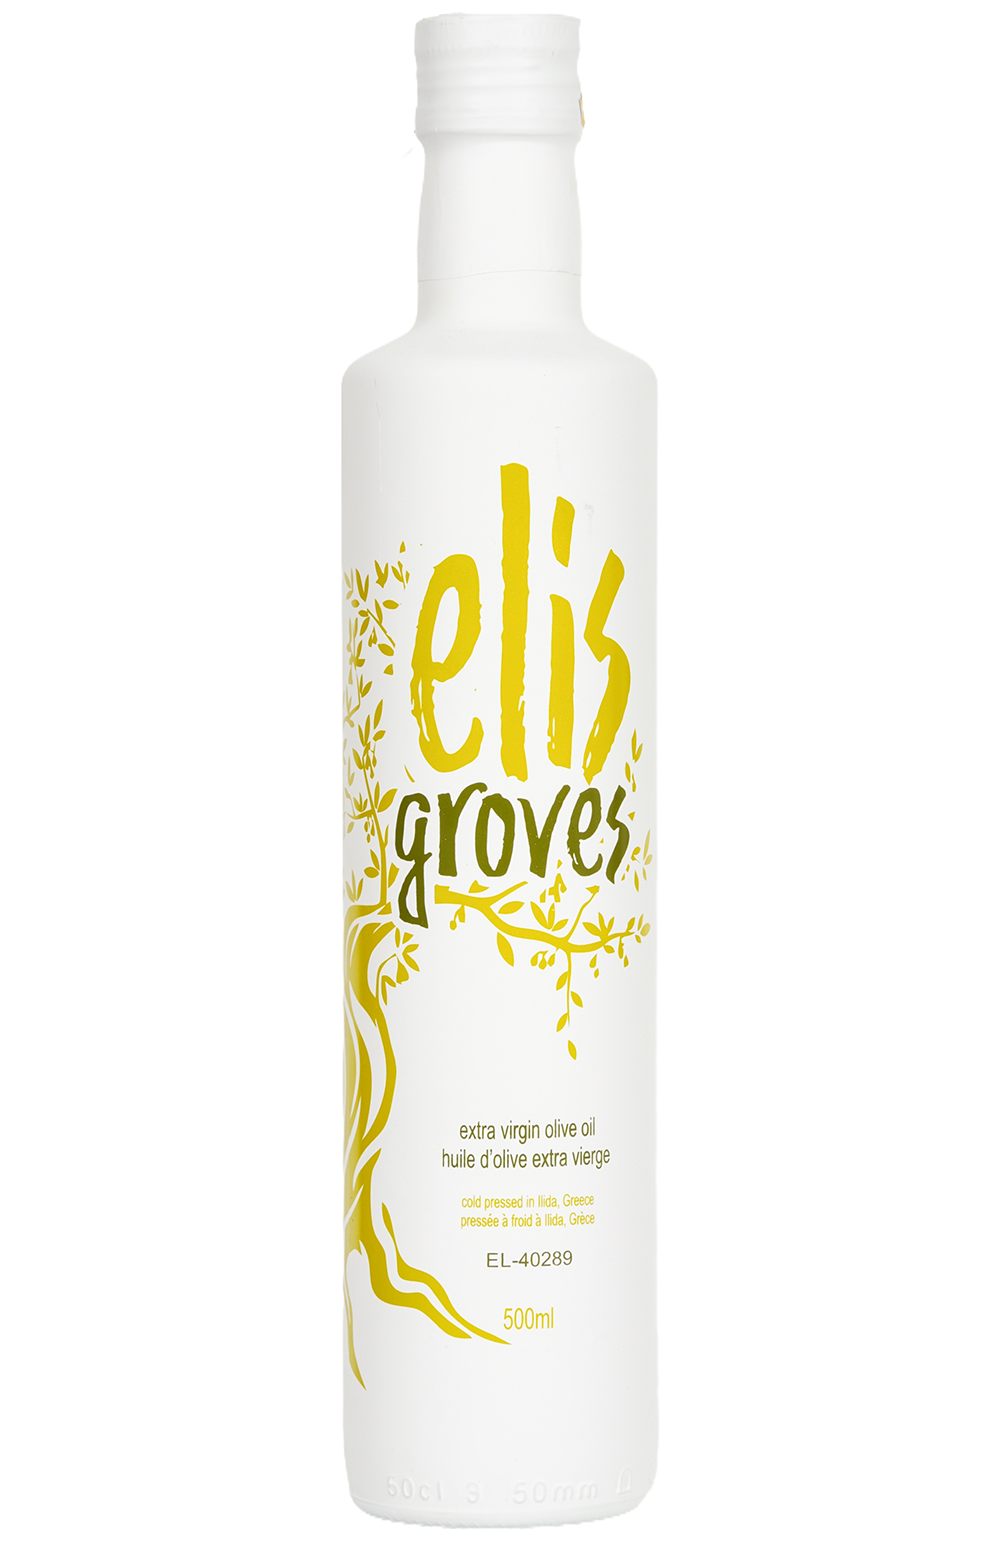 Elis Groves